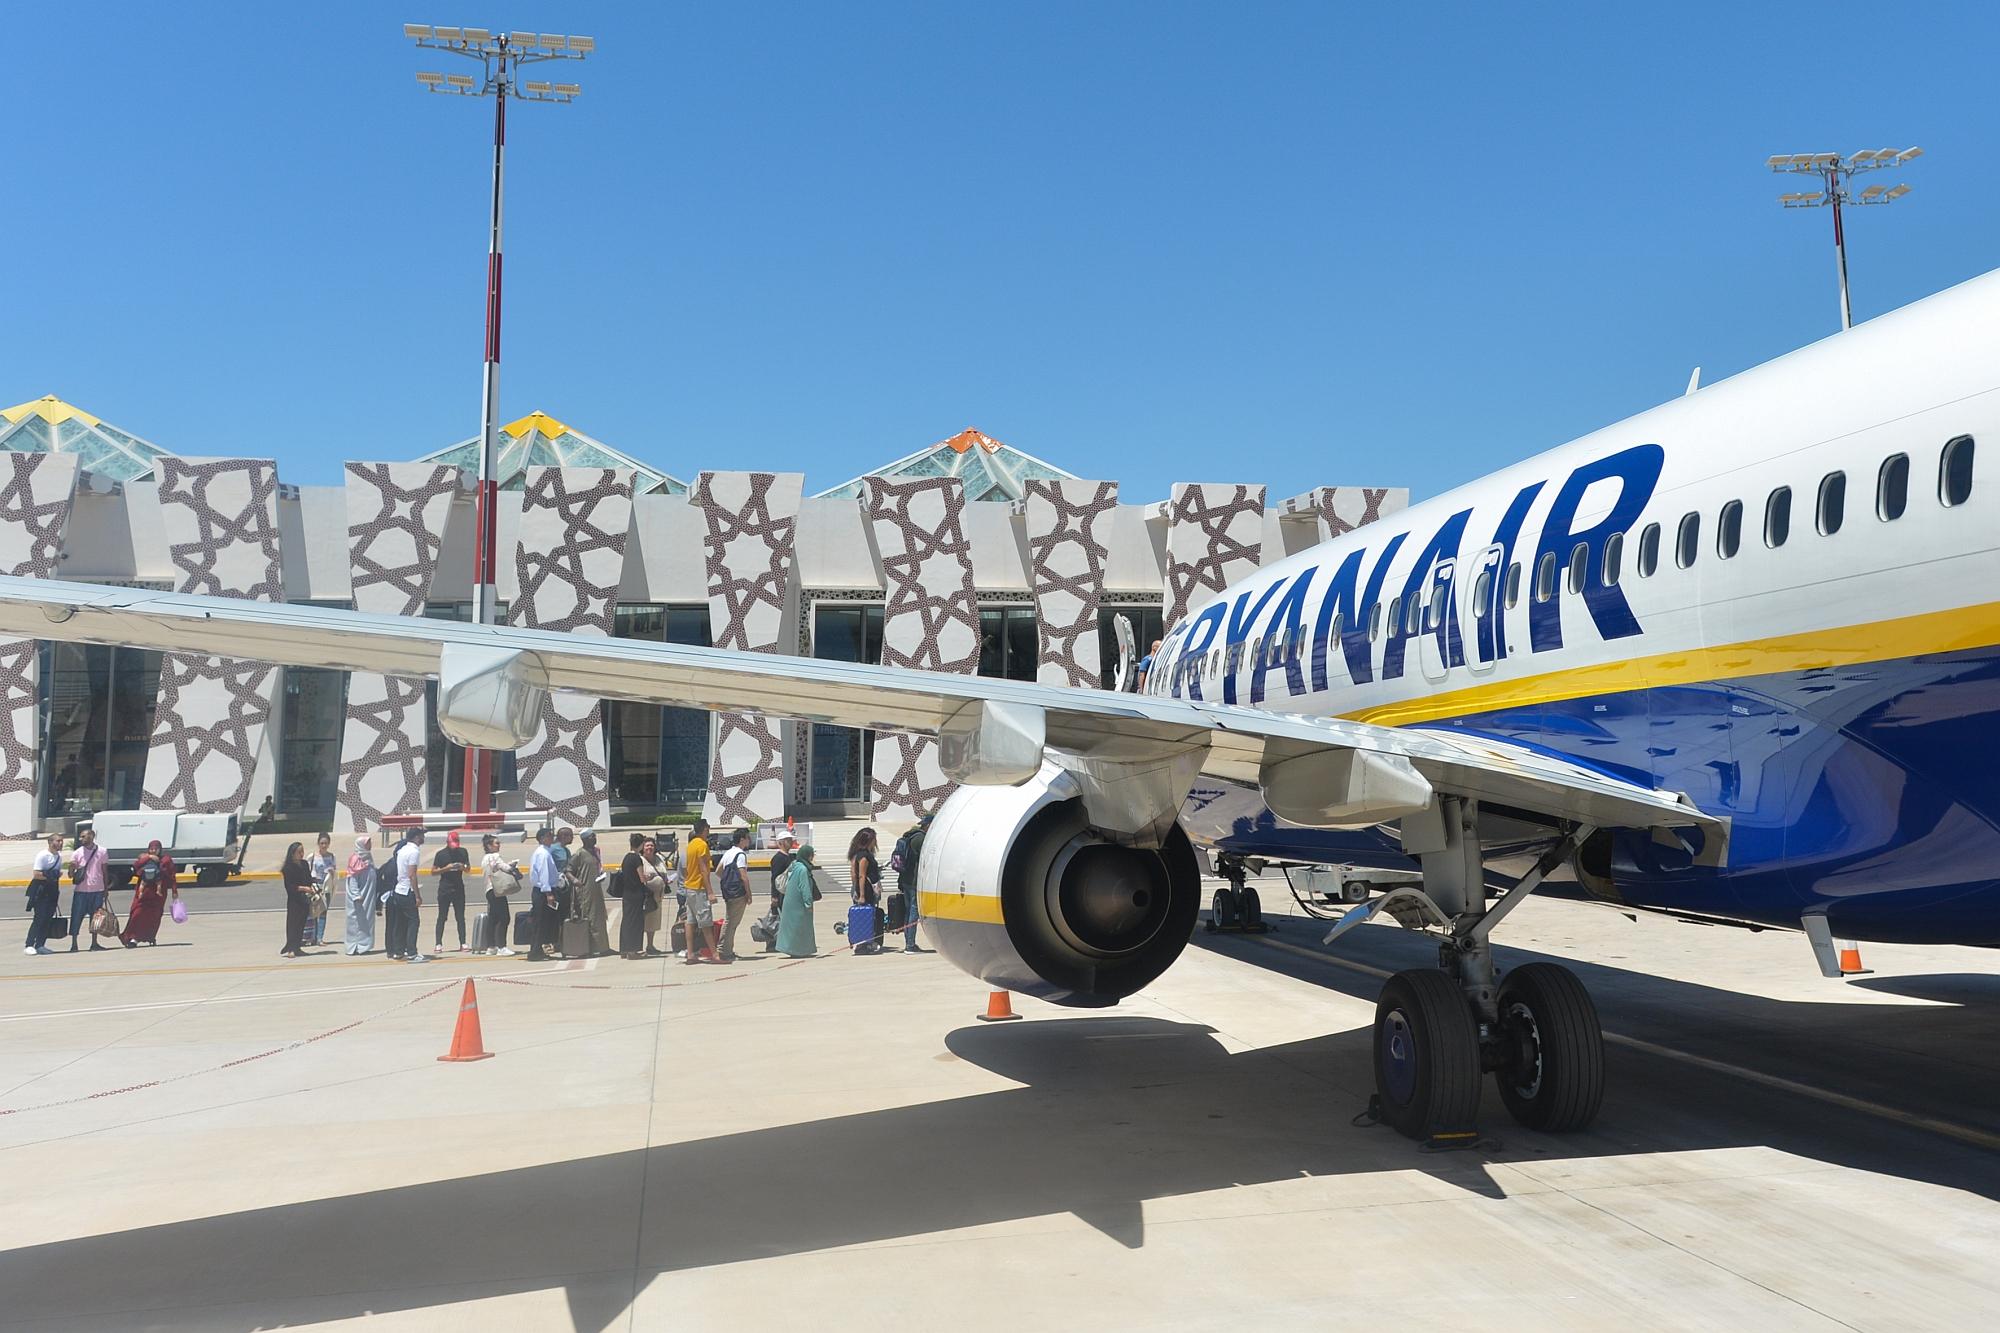 Passageiros embarcam no aeroporto de Fez, no Marrocos